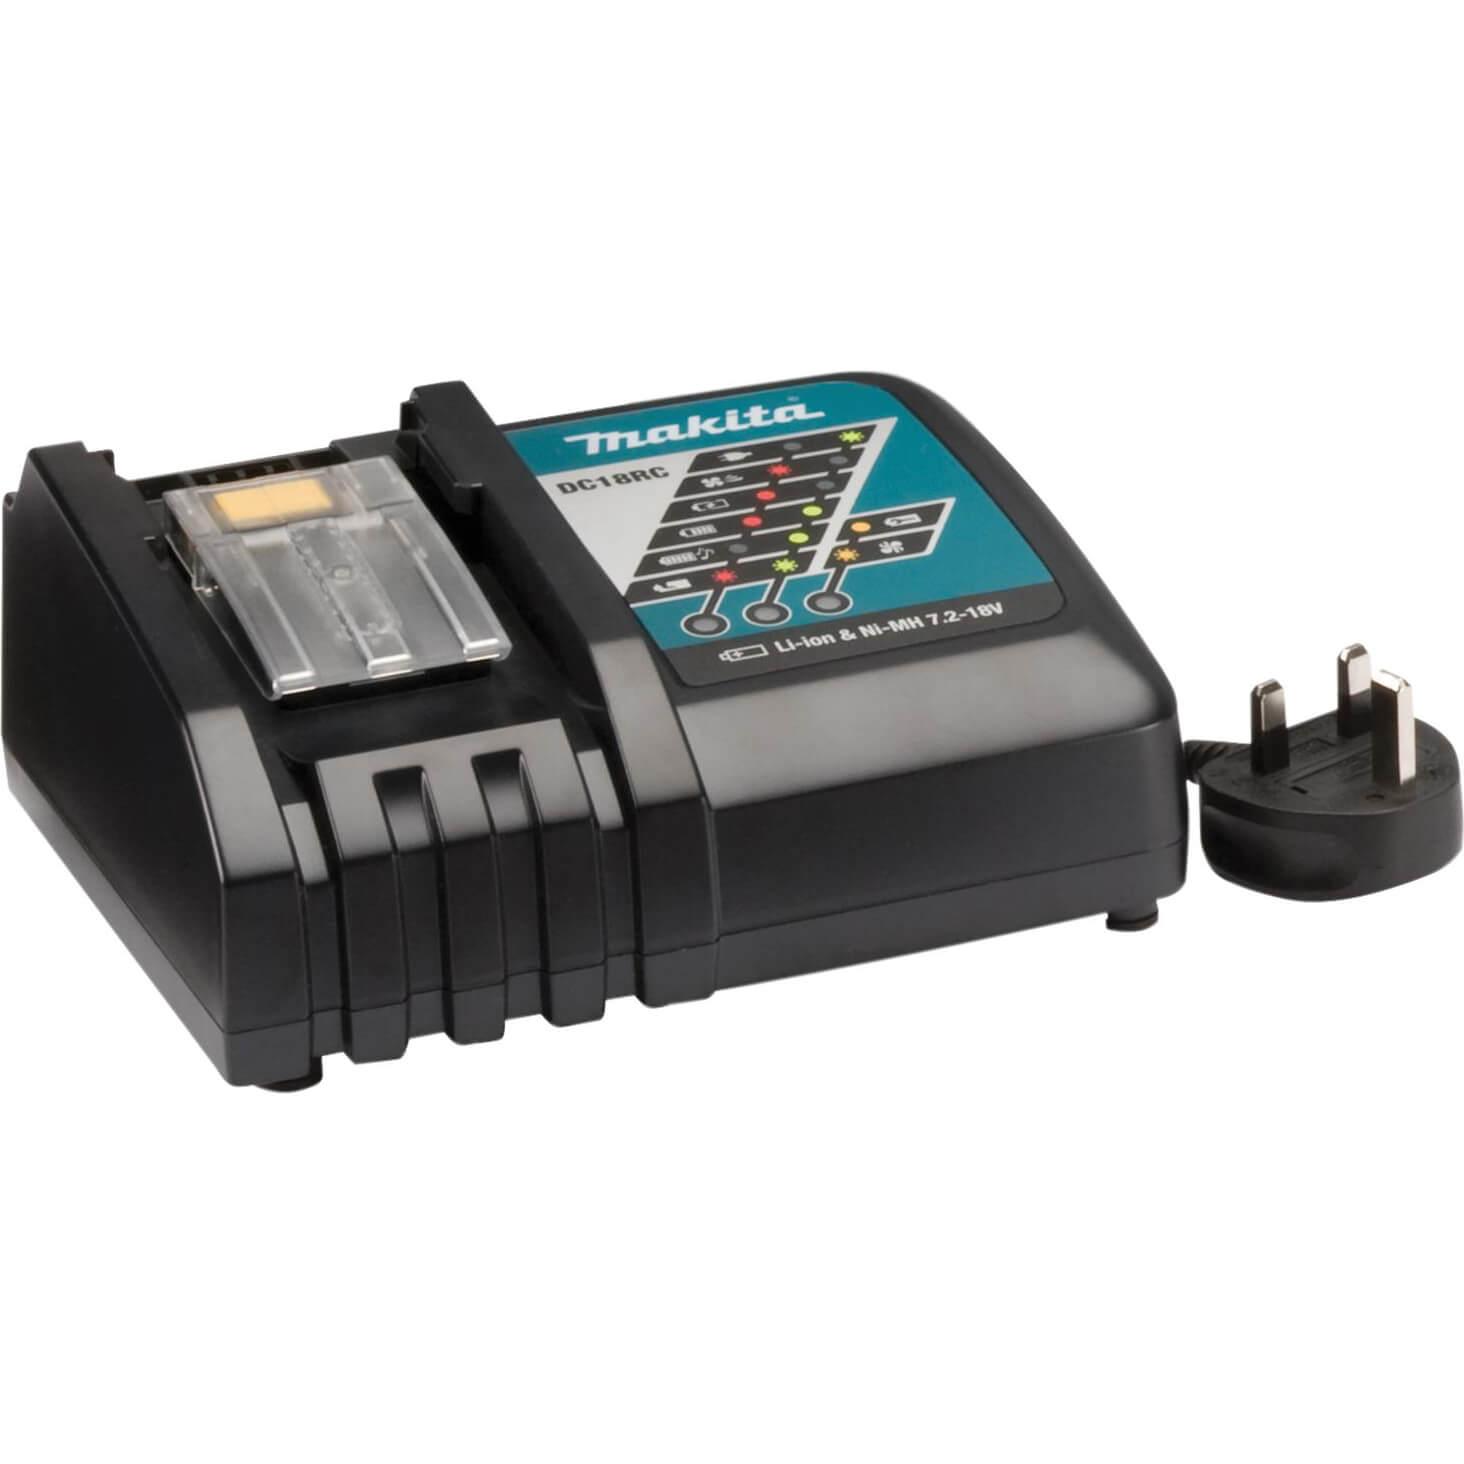 Makita Cordless Battery Charger For 7.2 - 18v